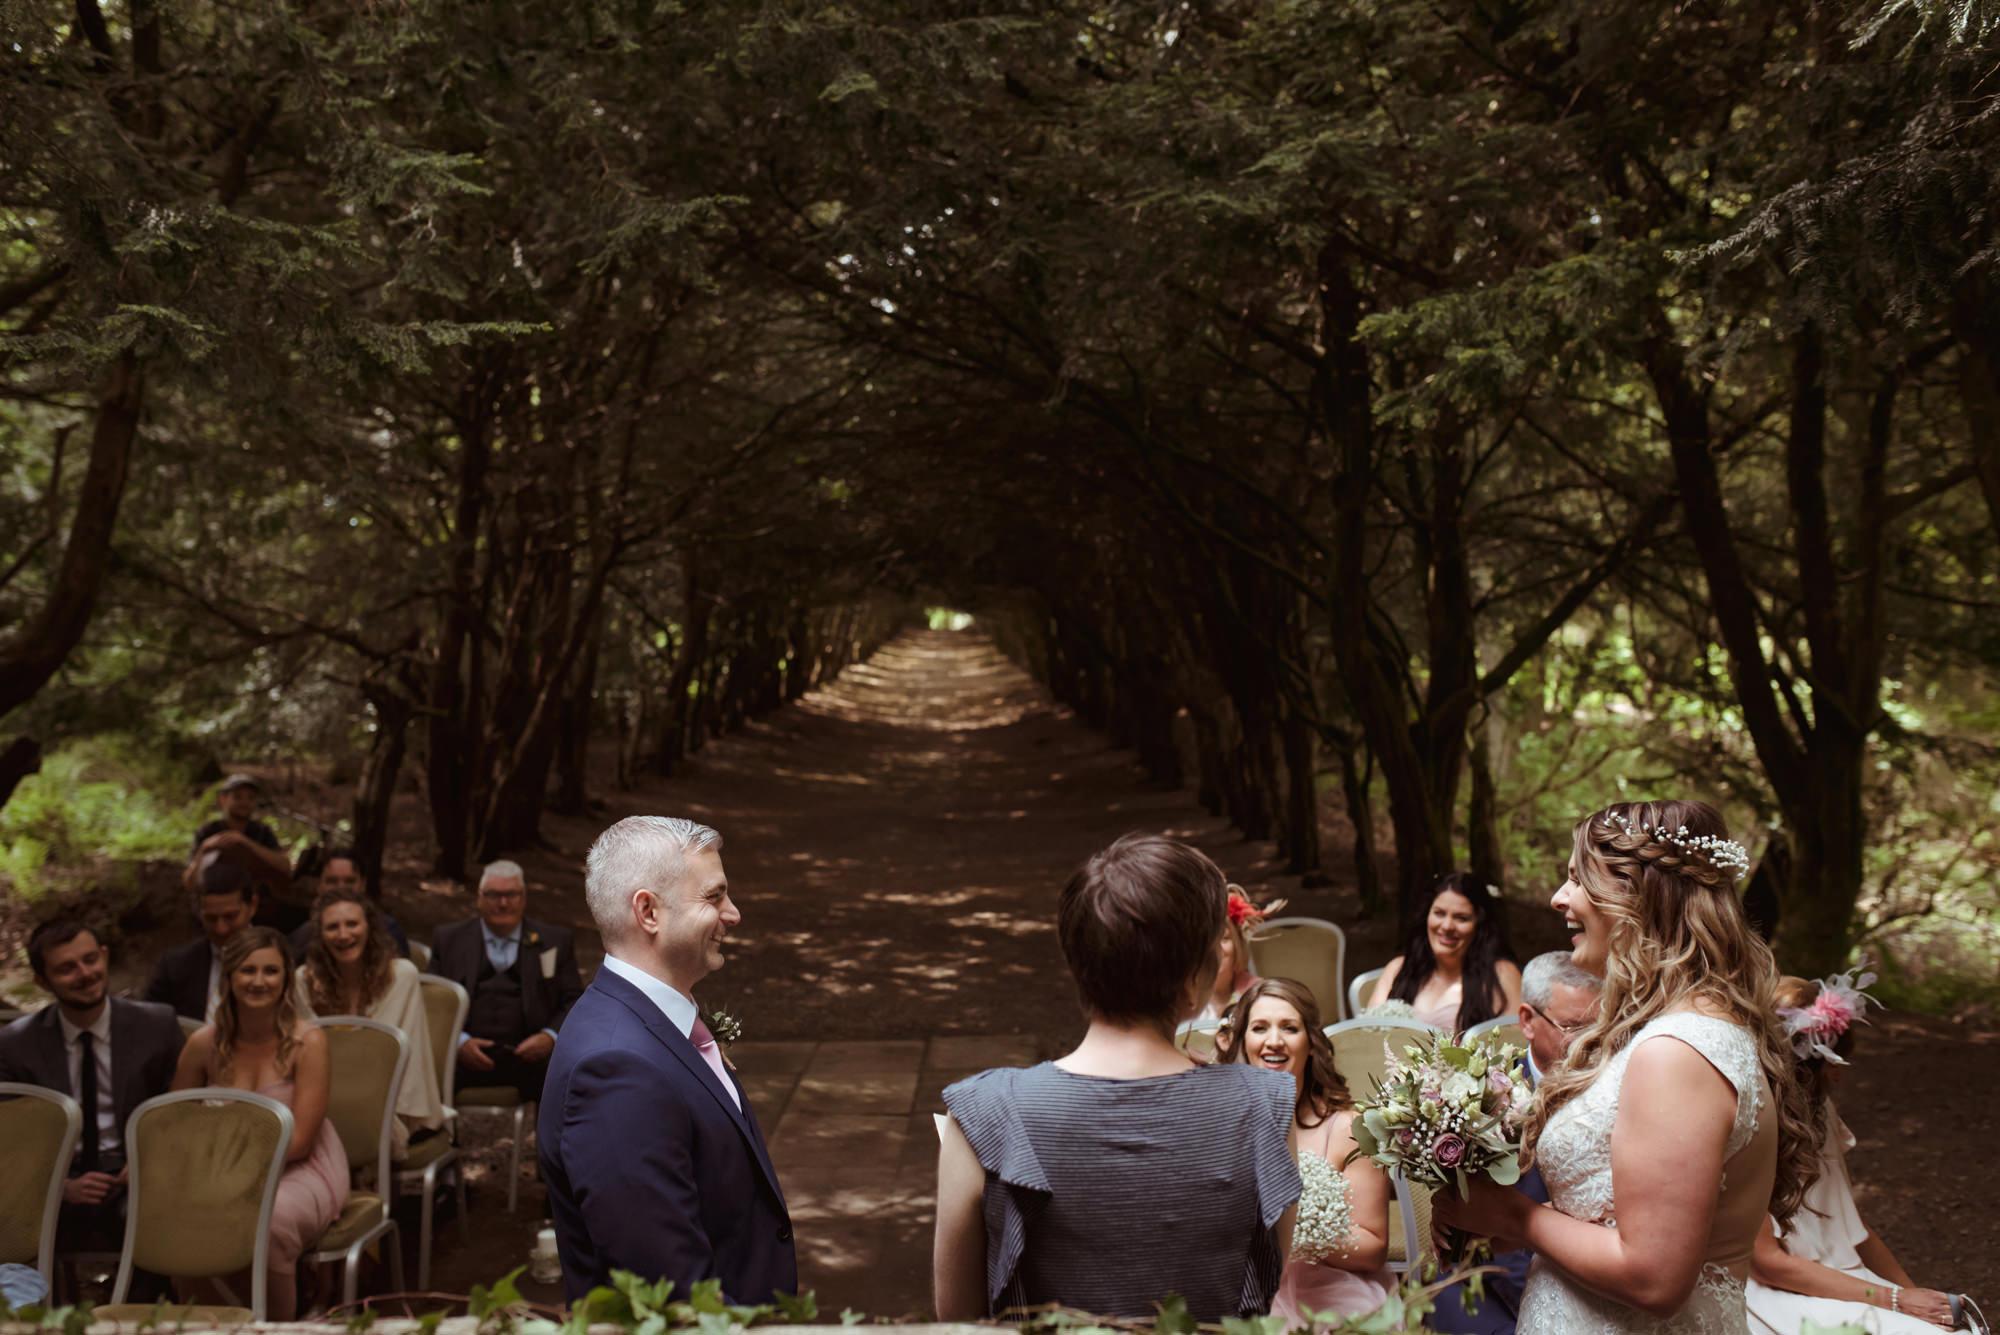 woodland-wedding-ceremony-scotland.jpg